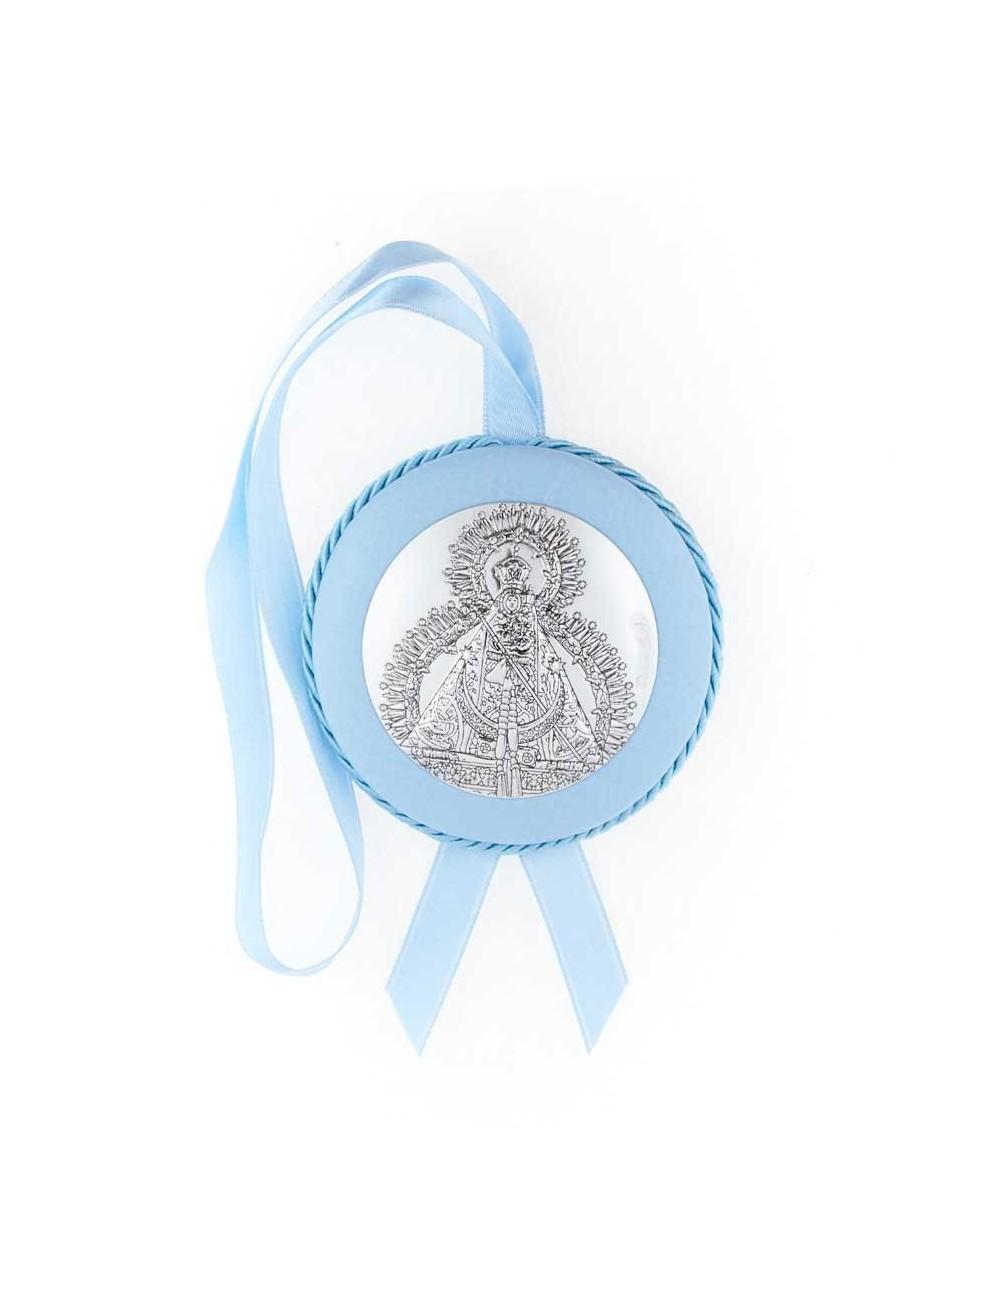 Medalla cuna Virgen de la Cabeza polipie azul musical